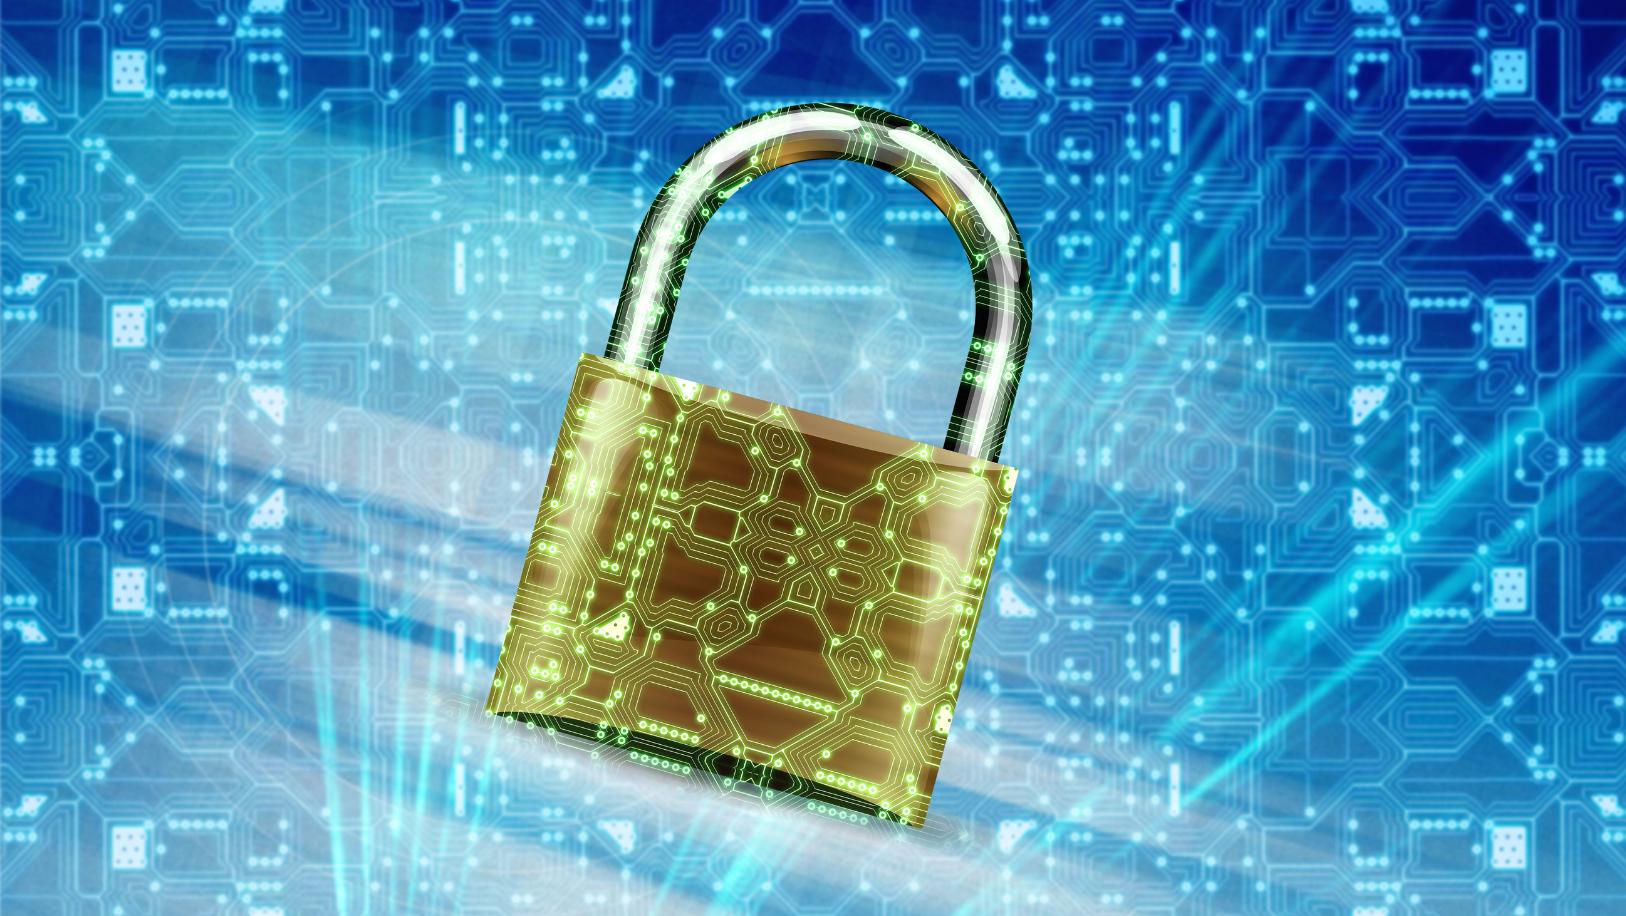 Read more about the article Schutzmaßnahmen gegen Cyberangriffe